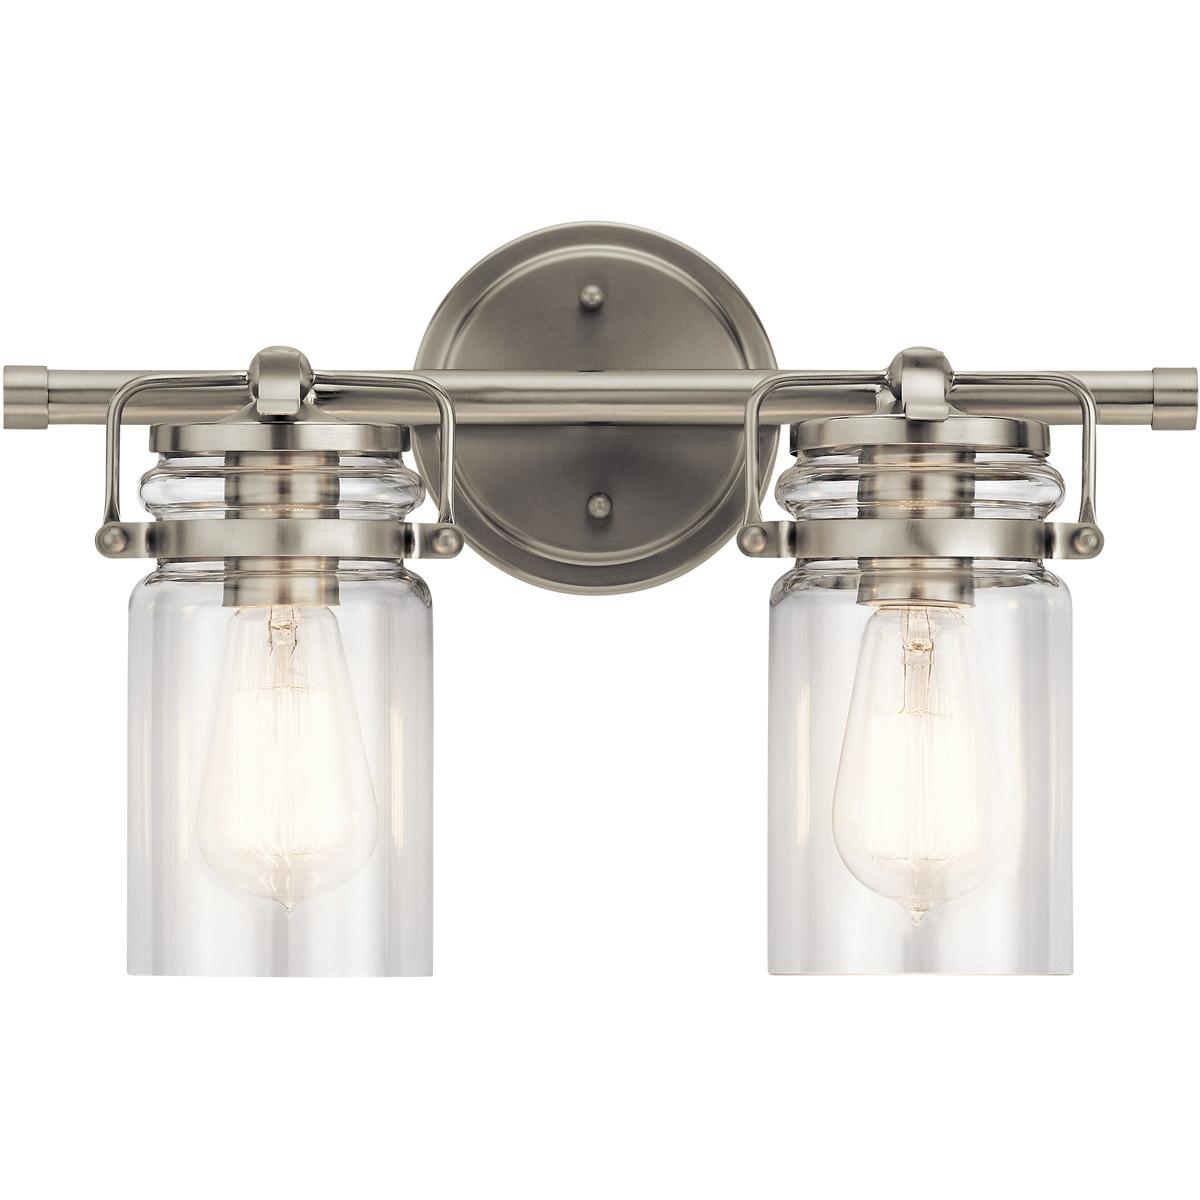 Kichler Lighting 45688ni Brinley